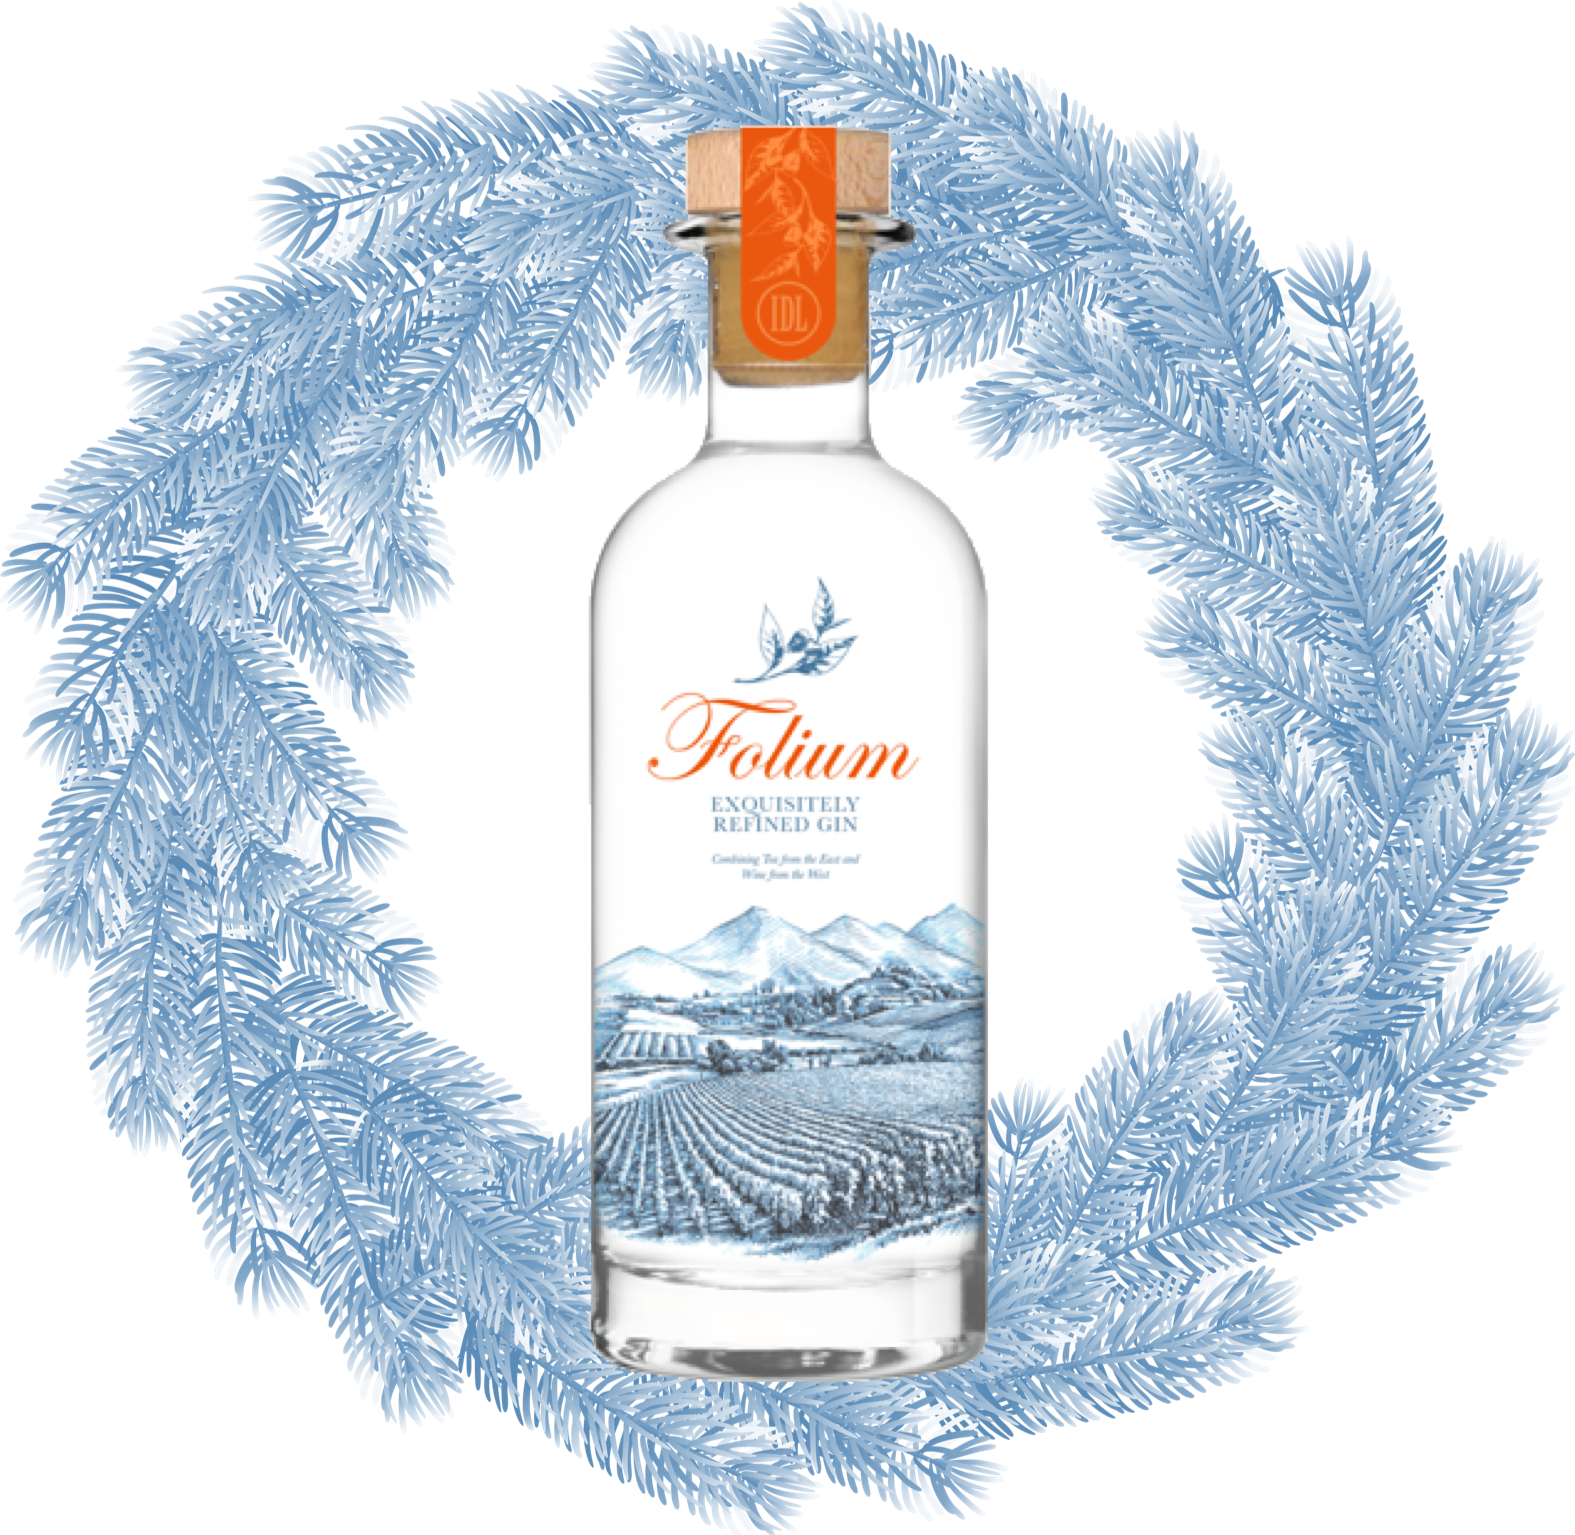 Christmas time at Folium Gin